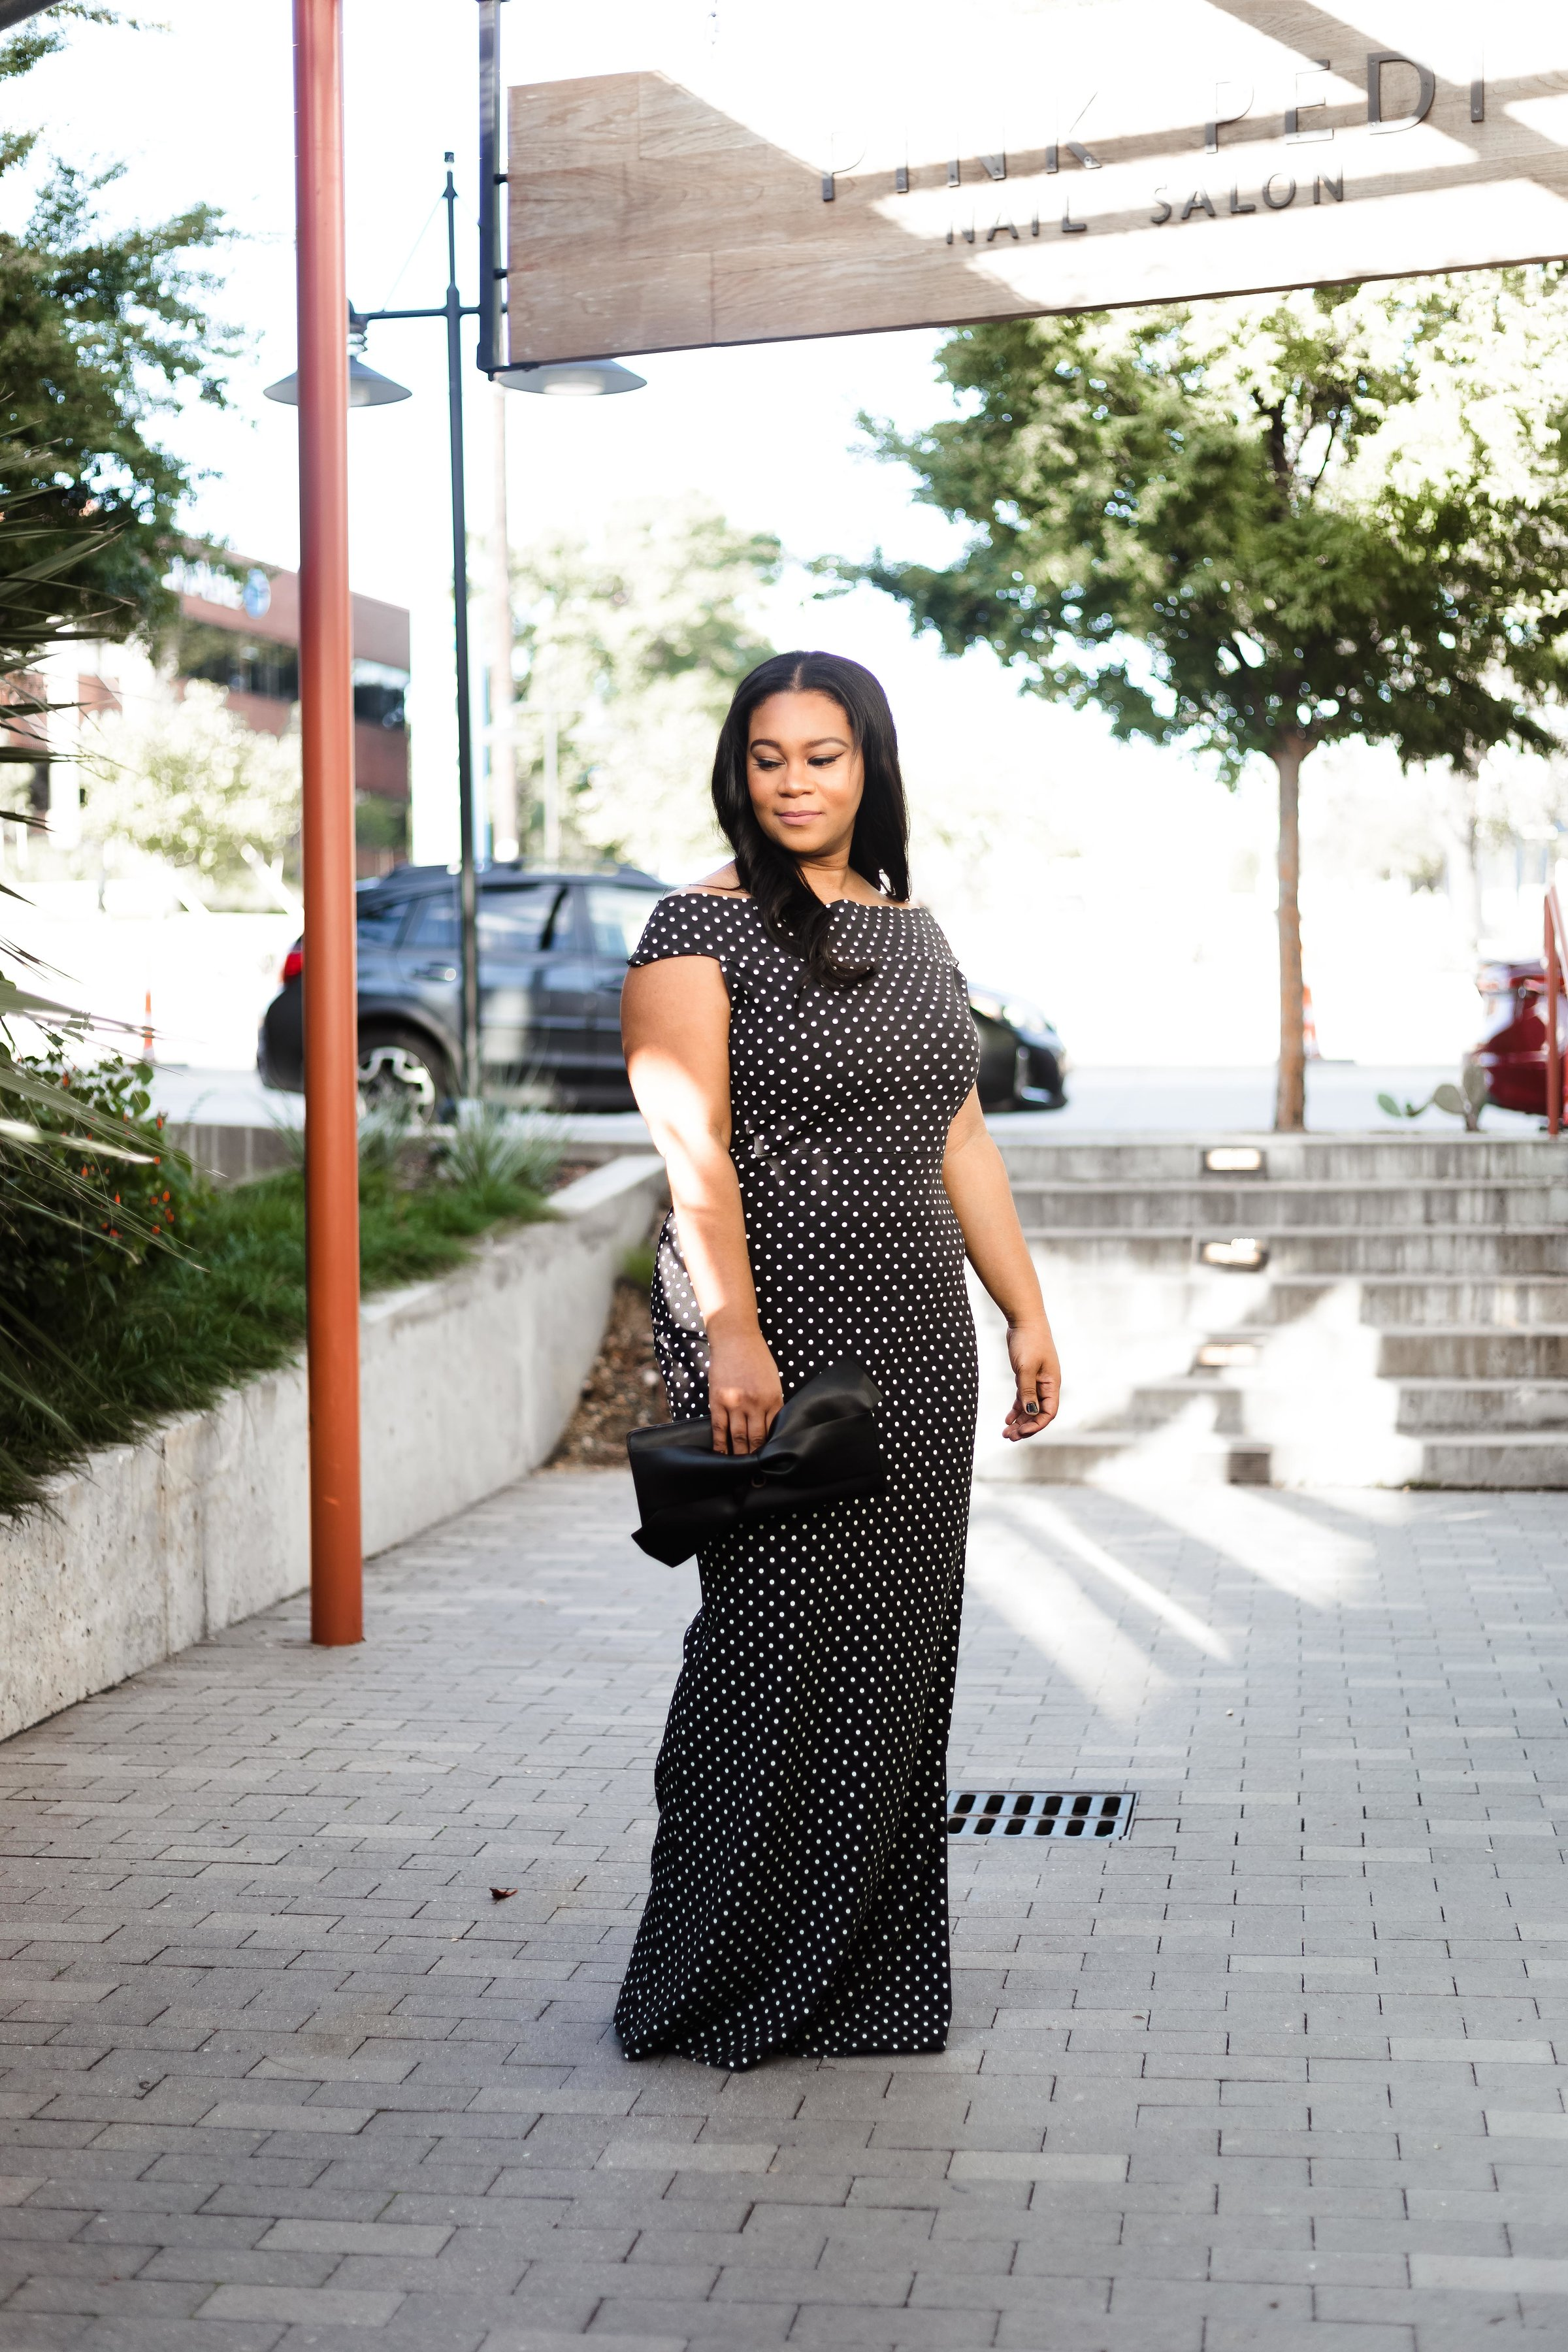 Polka Dot Maxi Dress - Natalie Greagor (8).jpg